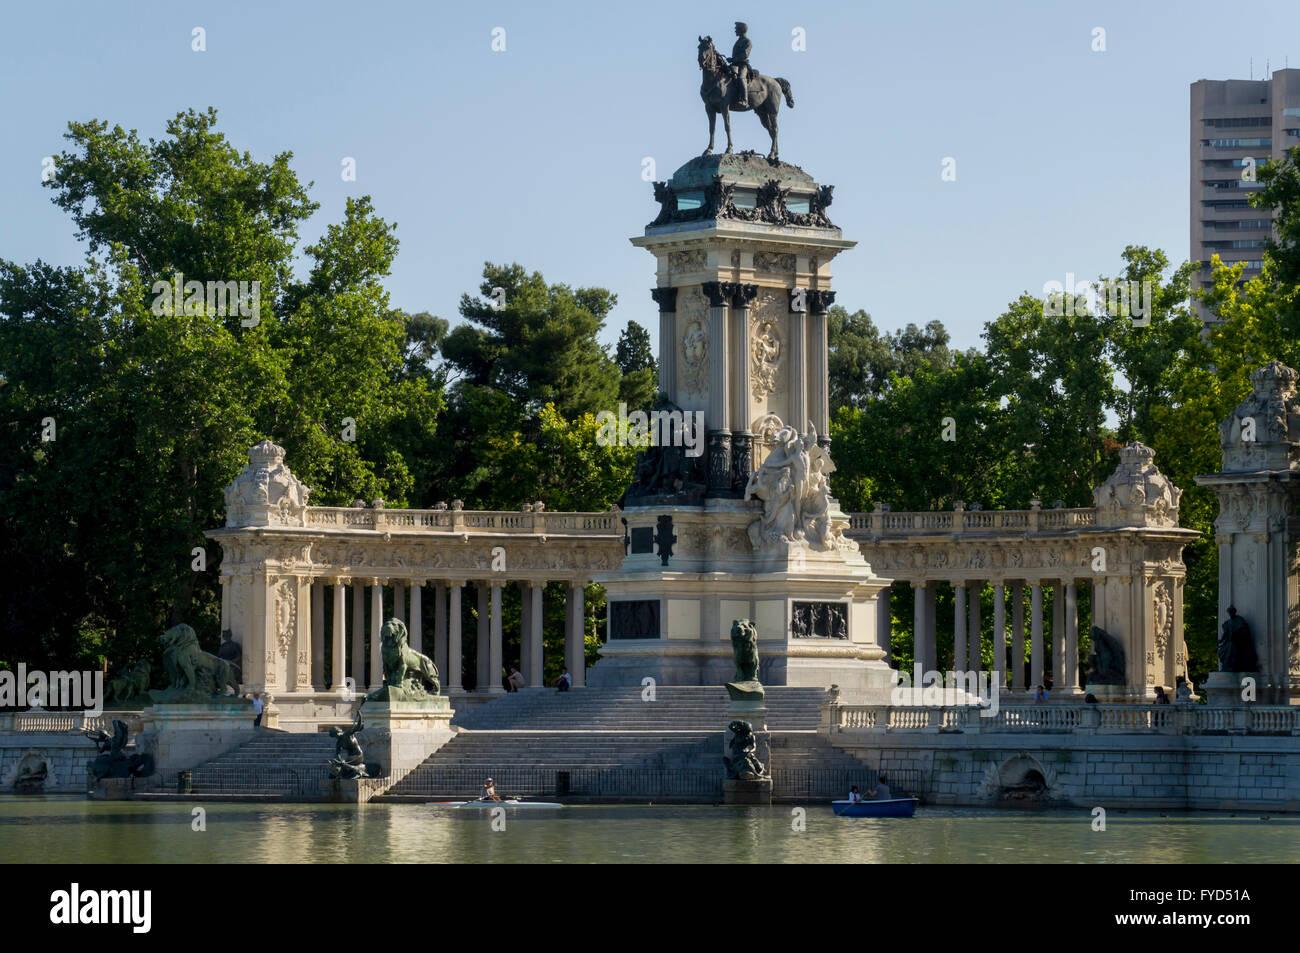 Europe, Spain, Madrid, Retiro, Alfonso XII monument Stock Photo